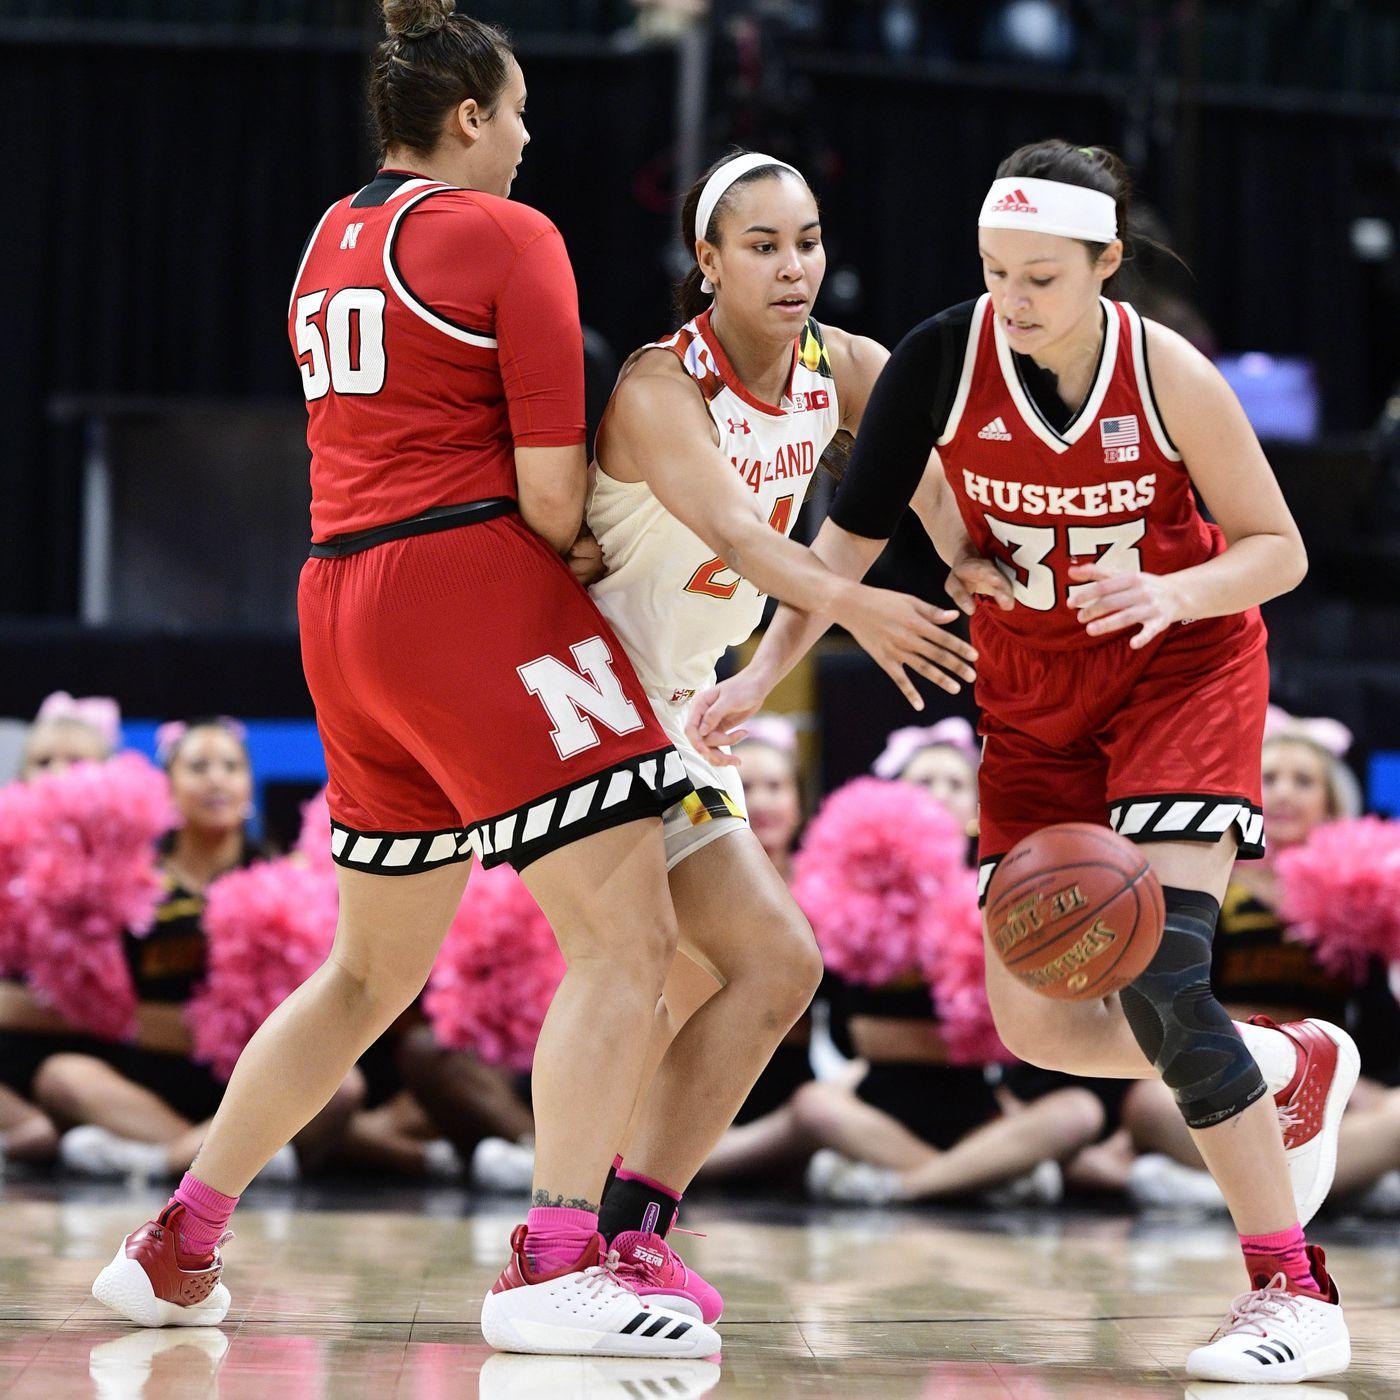 3bbd1c2fe904cc Nebraska Women s Basketball vs Northwestern Preview - Corn Nation